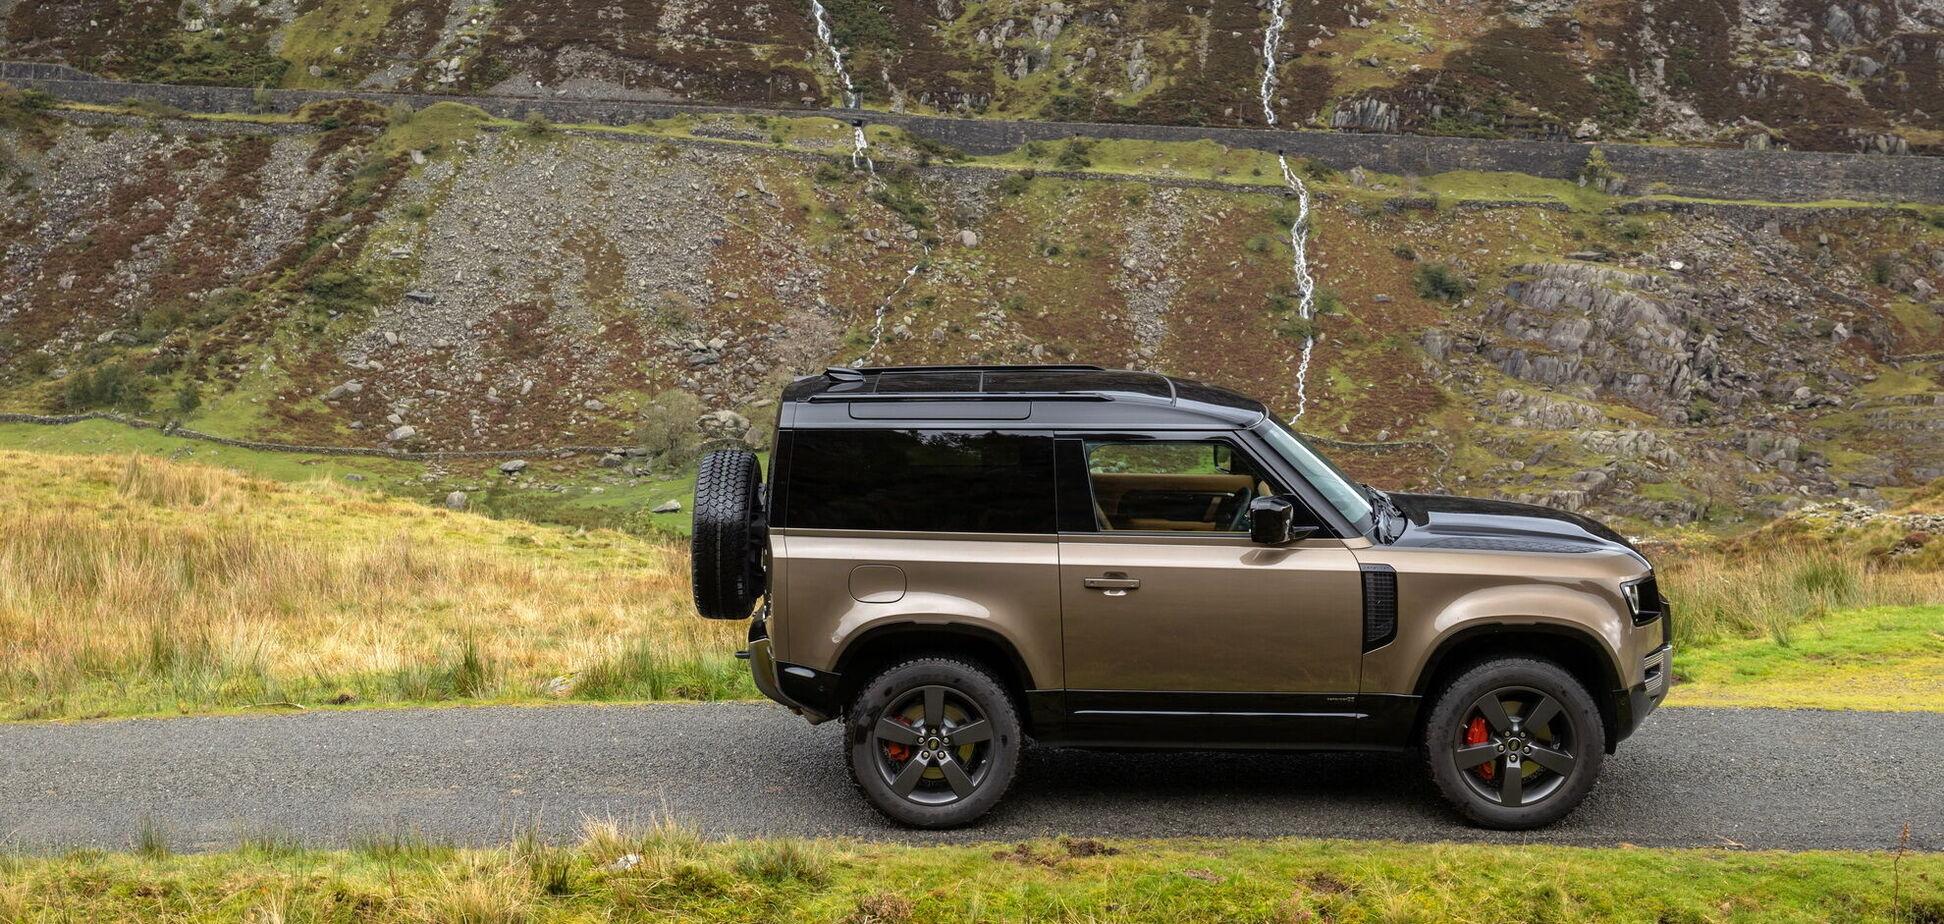 Тридверний Land Rover 90 збирається в Україну